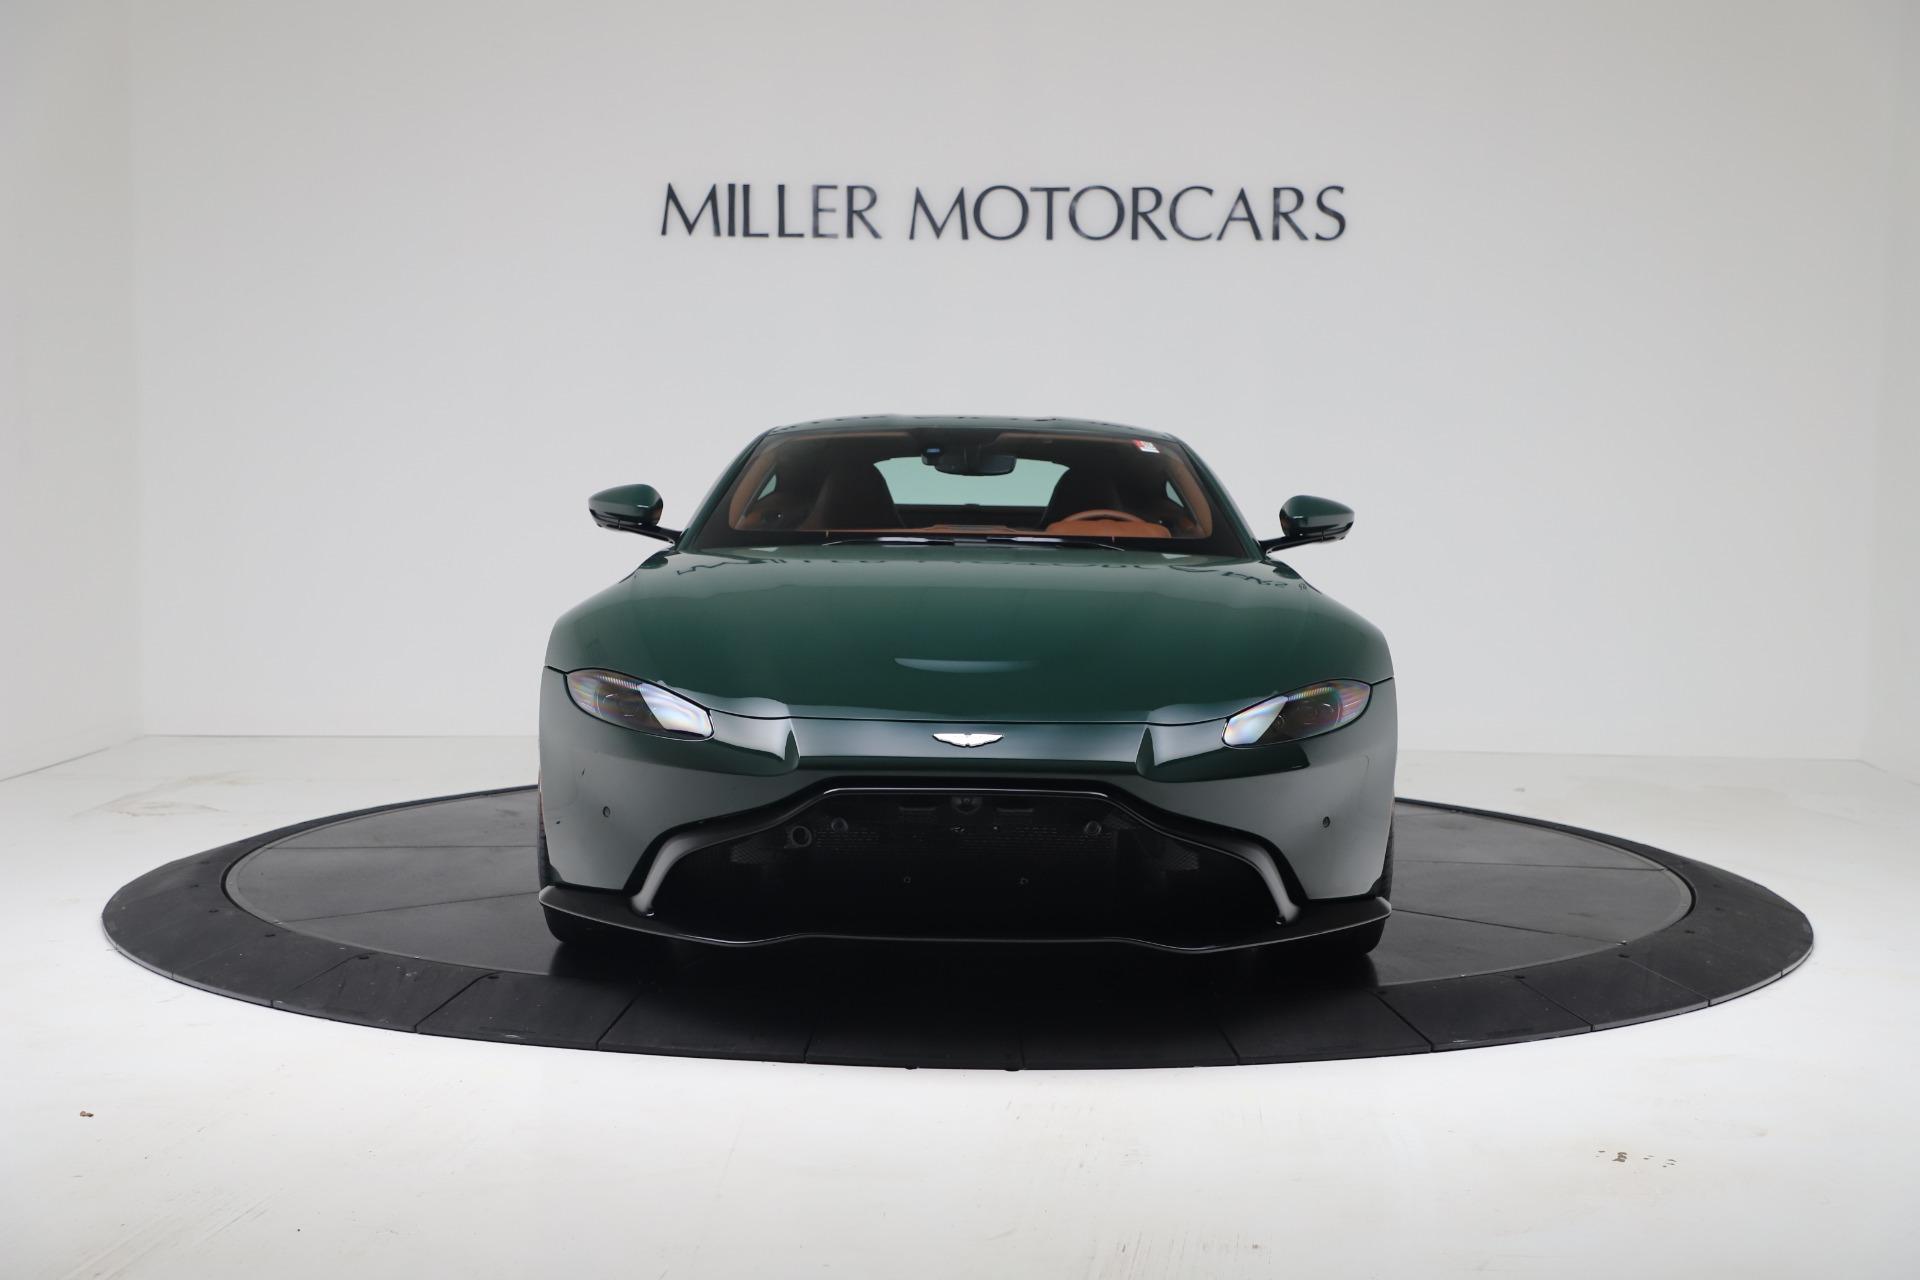 New 2020 Aston Martin Vantage V8 For Sale In Greenwich, CT 3483_p3